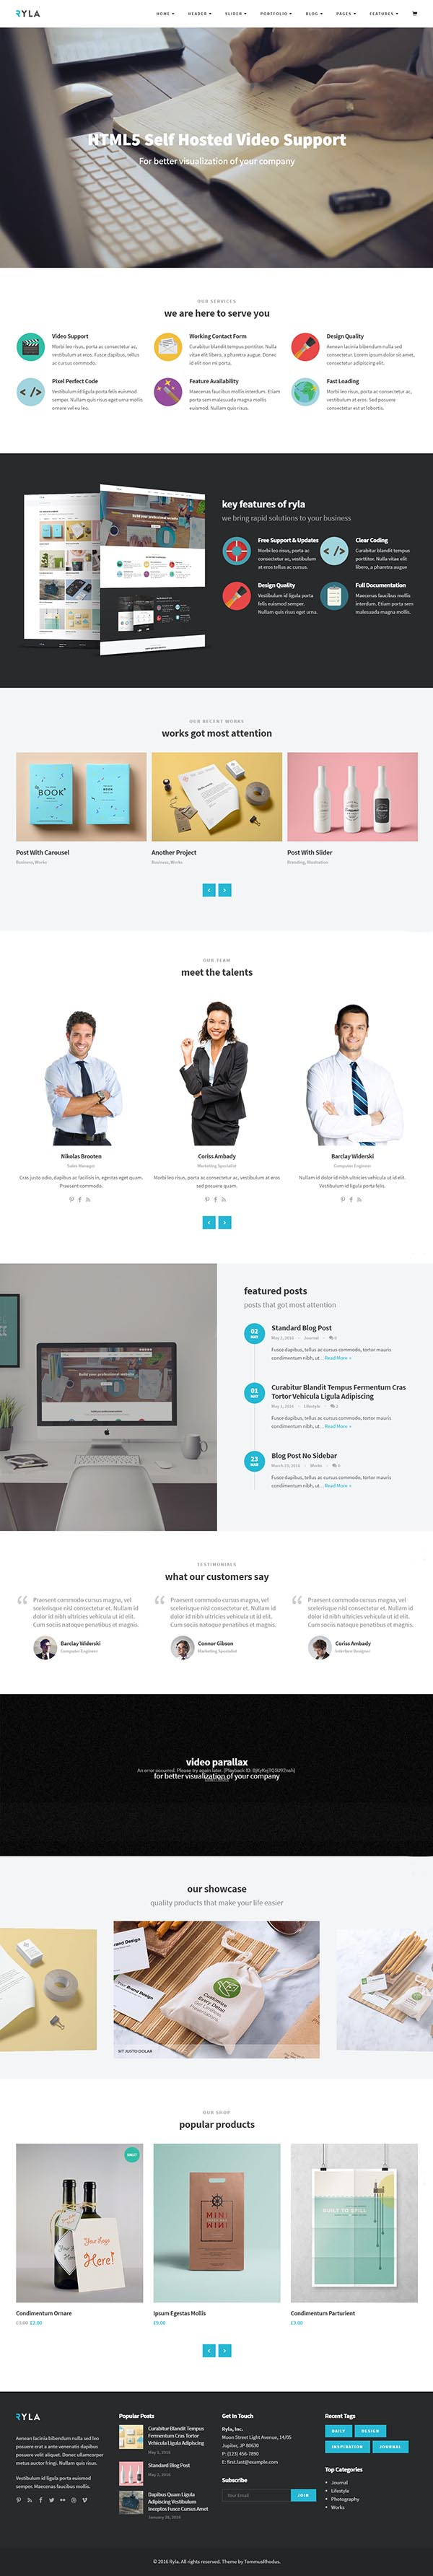 Ryla – Multipurpose Single/Multi Page WordPress Theme